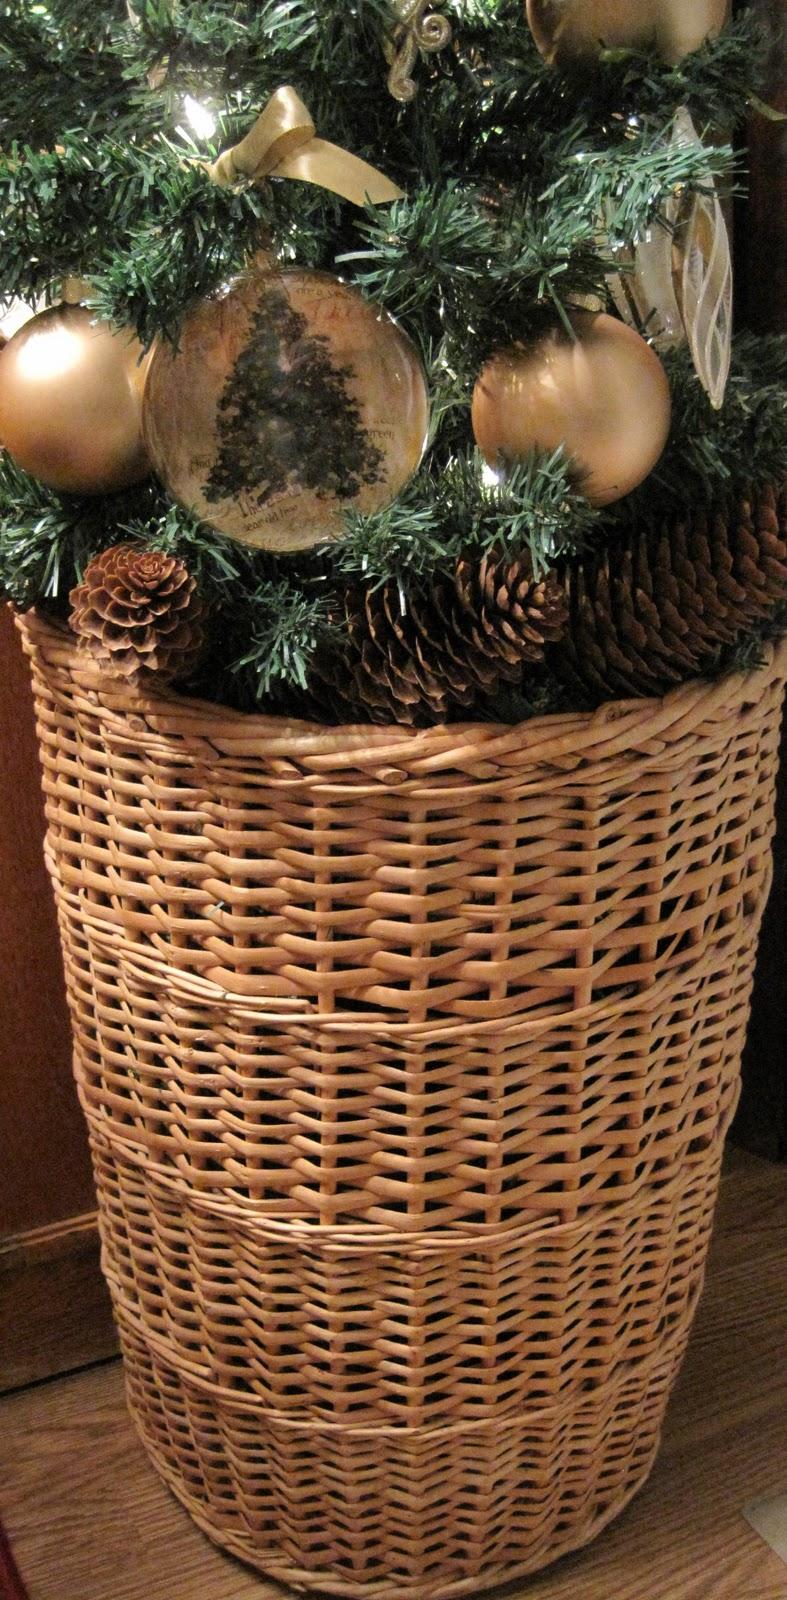 On Crooked Creek Christmas Tree Times Three